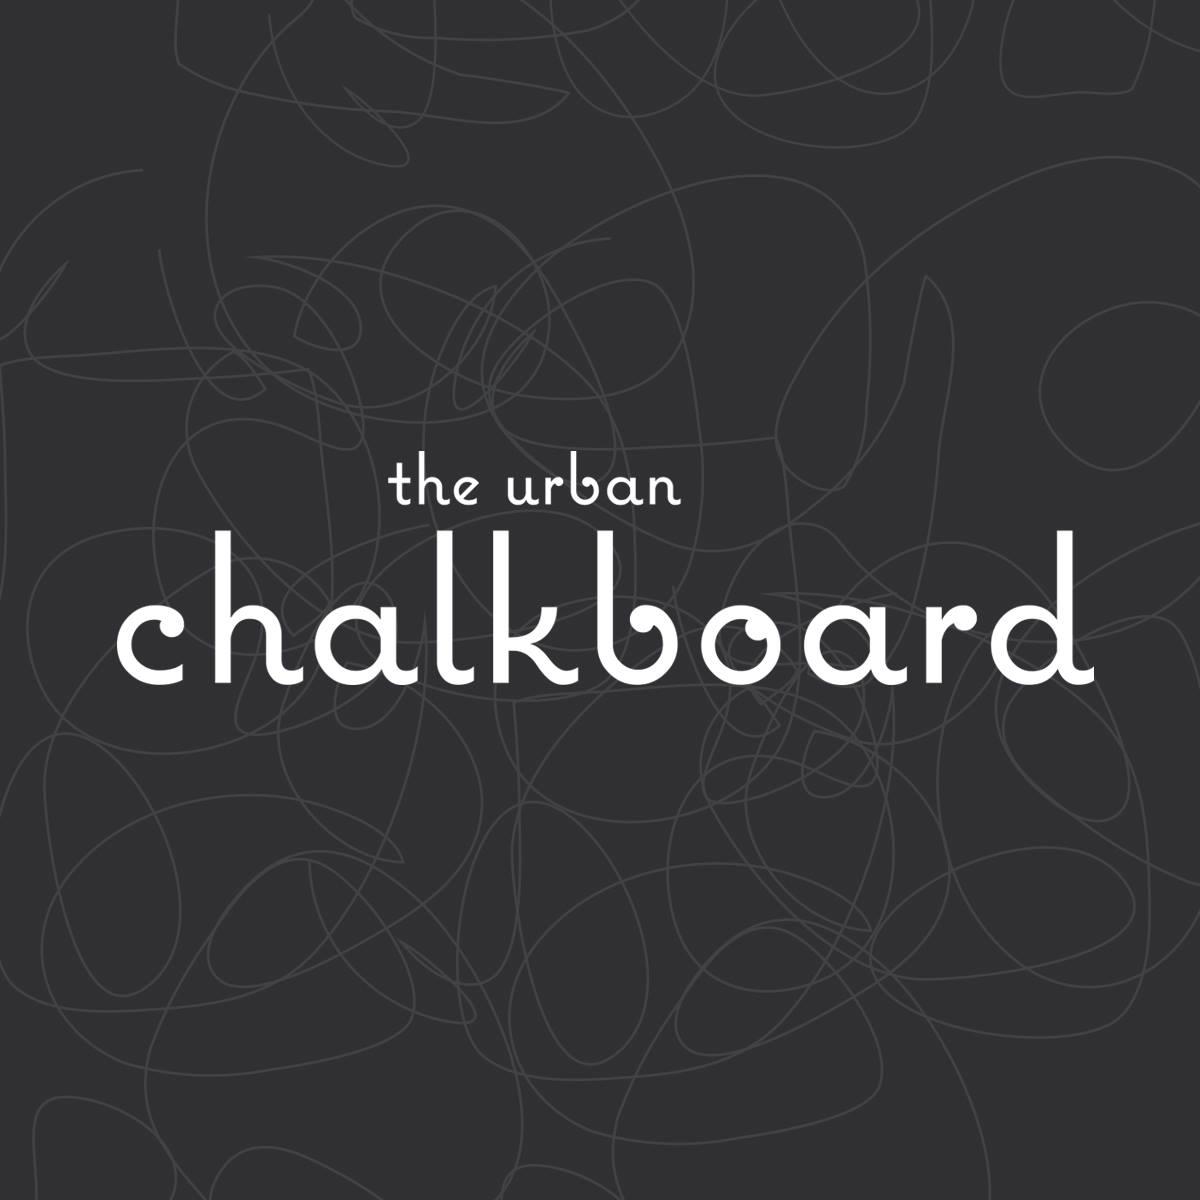 Urban Chalkboard